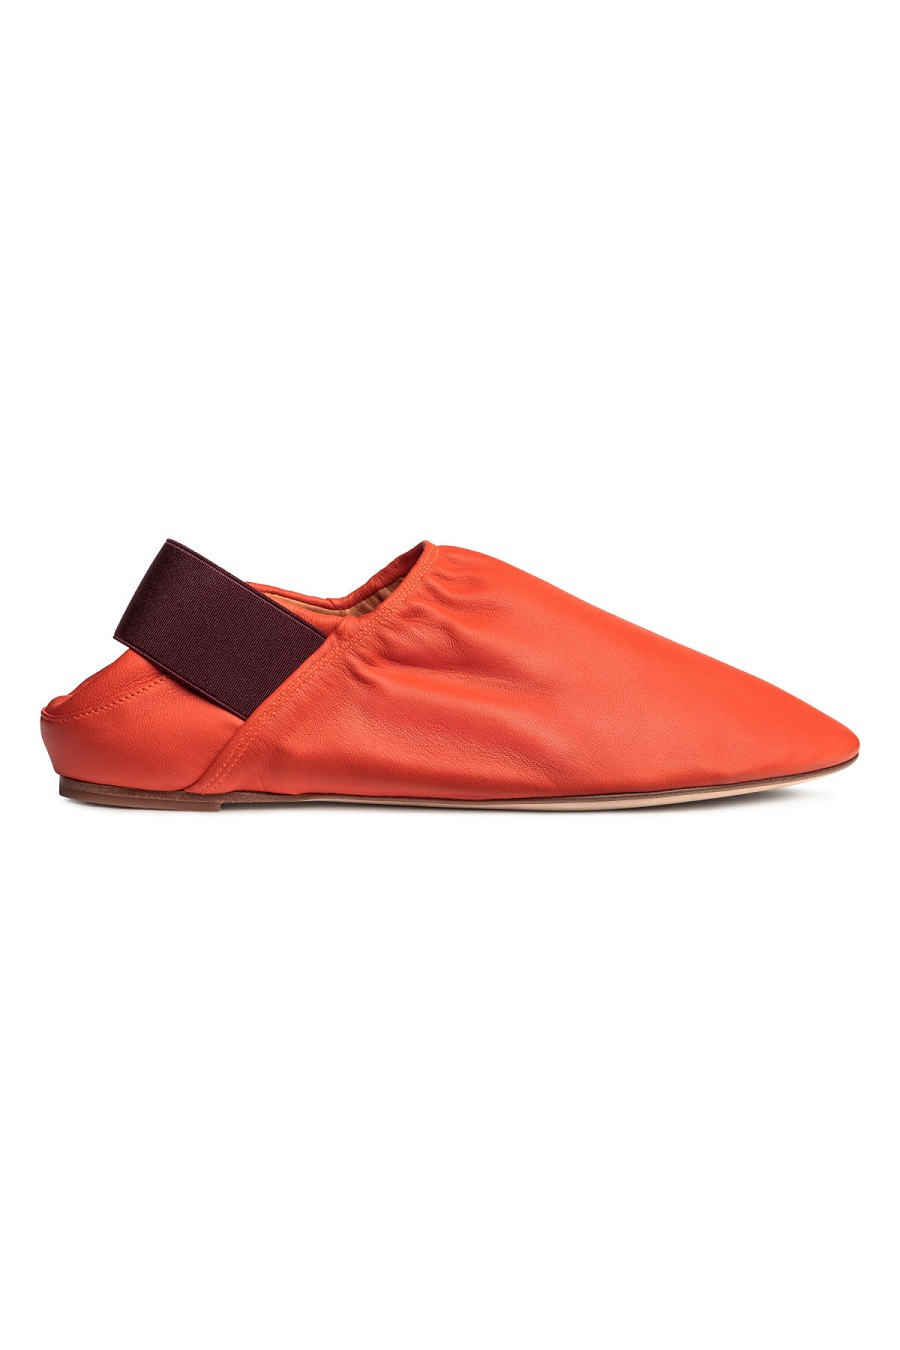 Tampil Kece saat Bukber, Sepatu Kamu Harus On Point